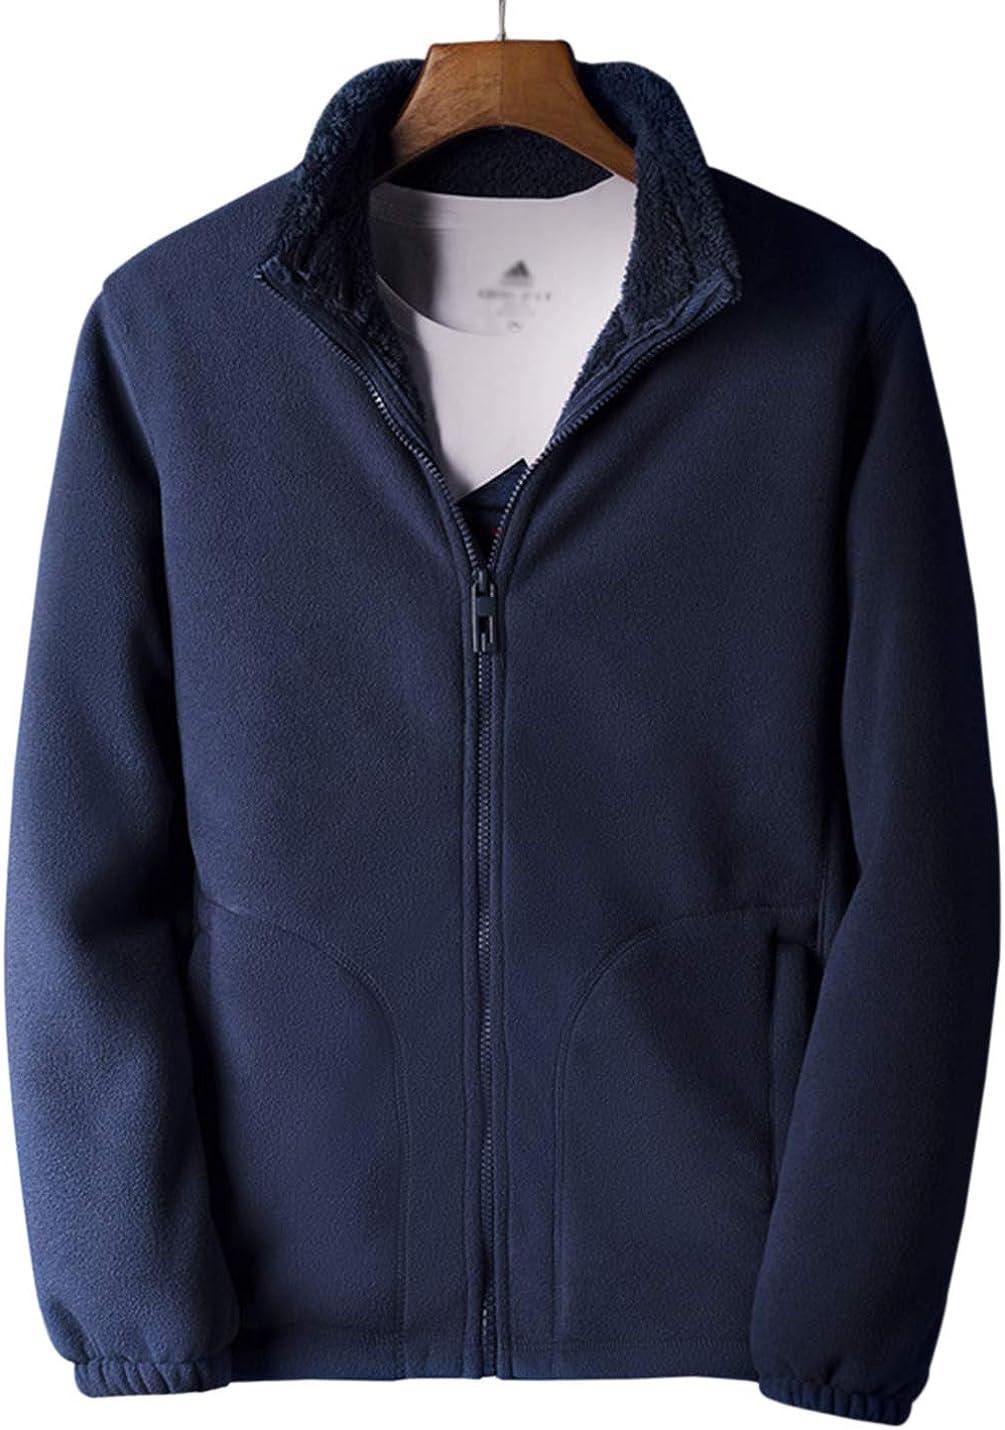 Gihuo Men's Casual Active Sherpa Lined Fleece Jacket